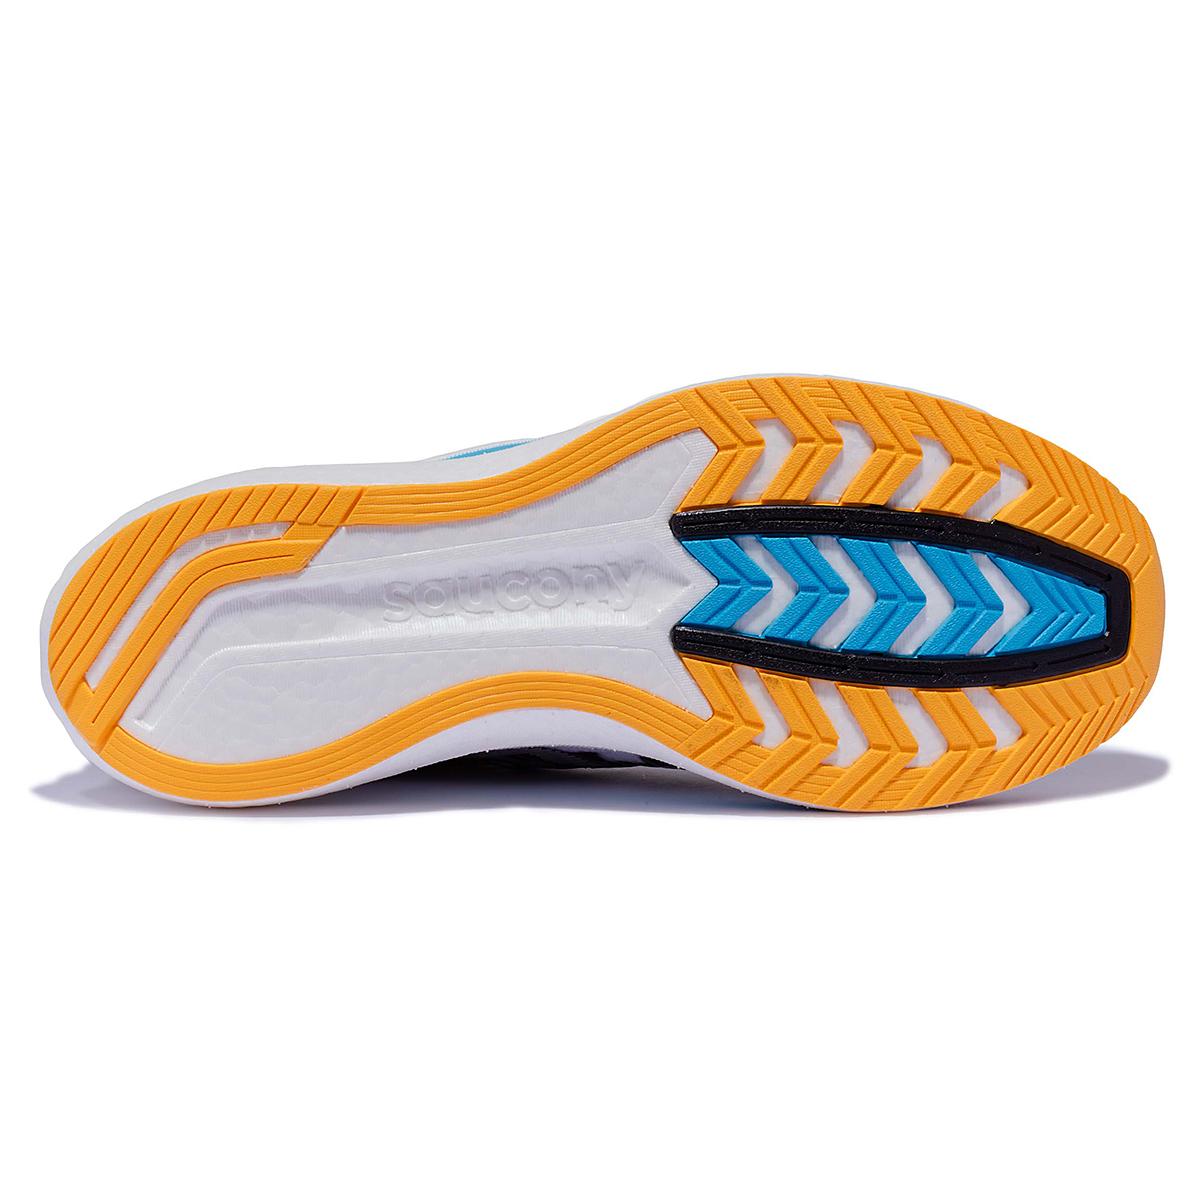 Men's Saucony Endorphin Speed 2 Running Shoe - Color: Reverie - Size: 7 - Width: Regular, Reverie, large, image 4